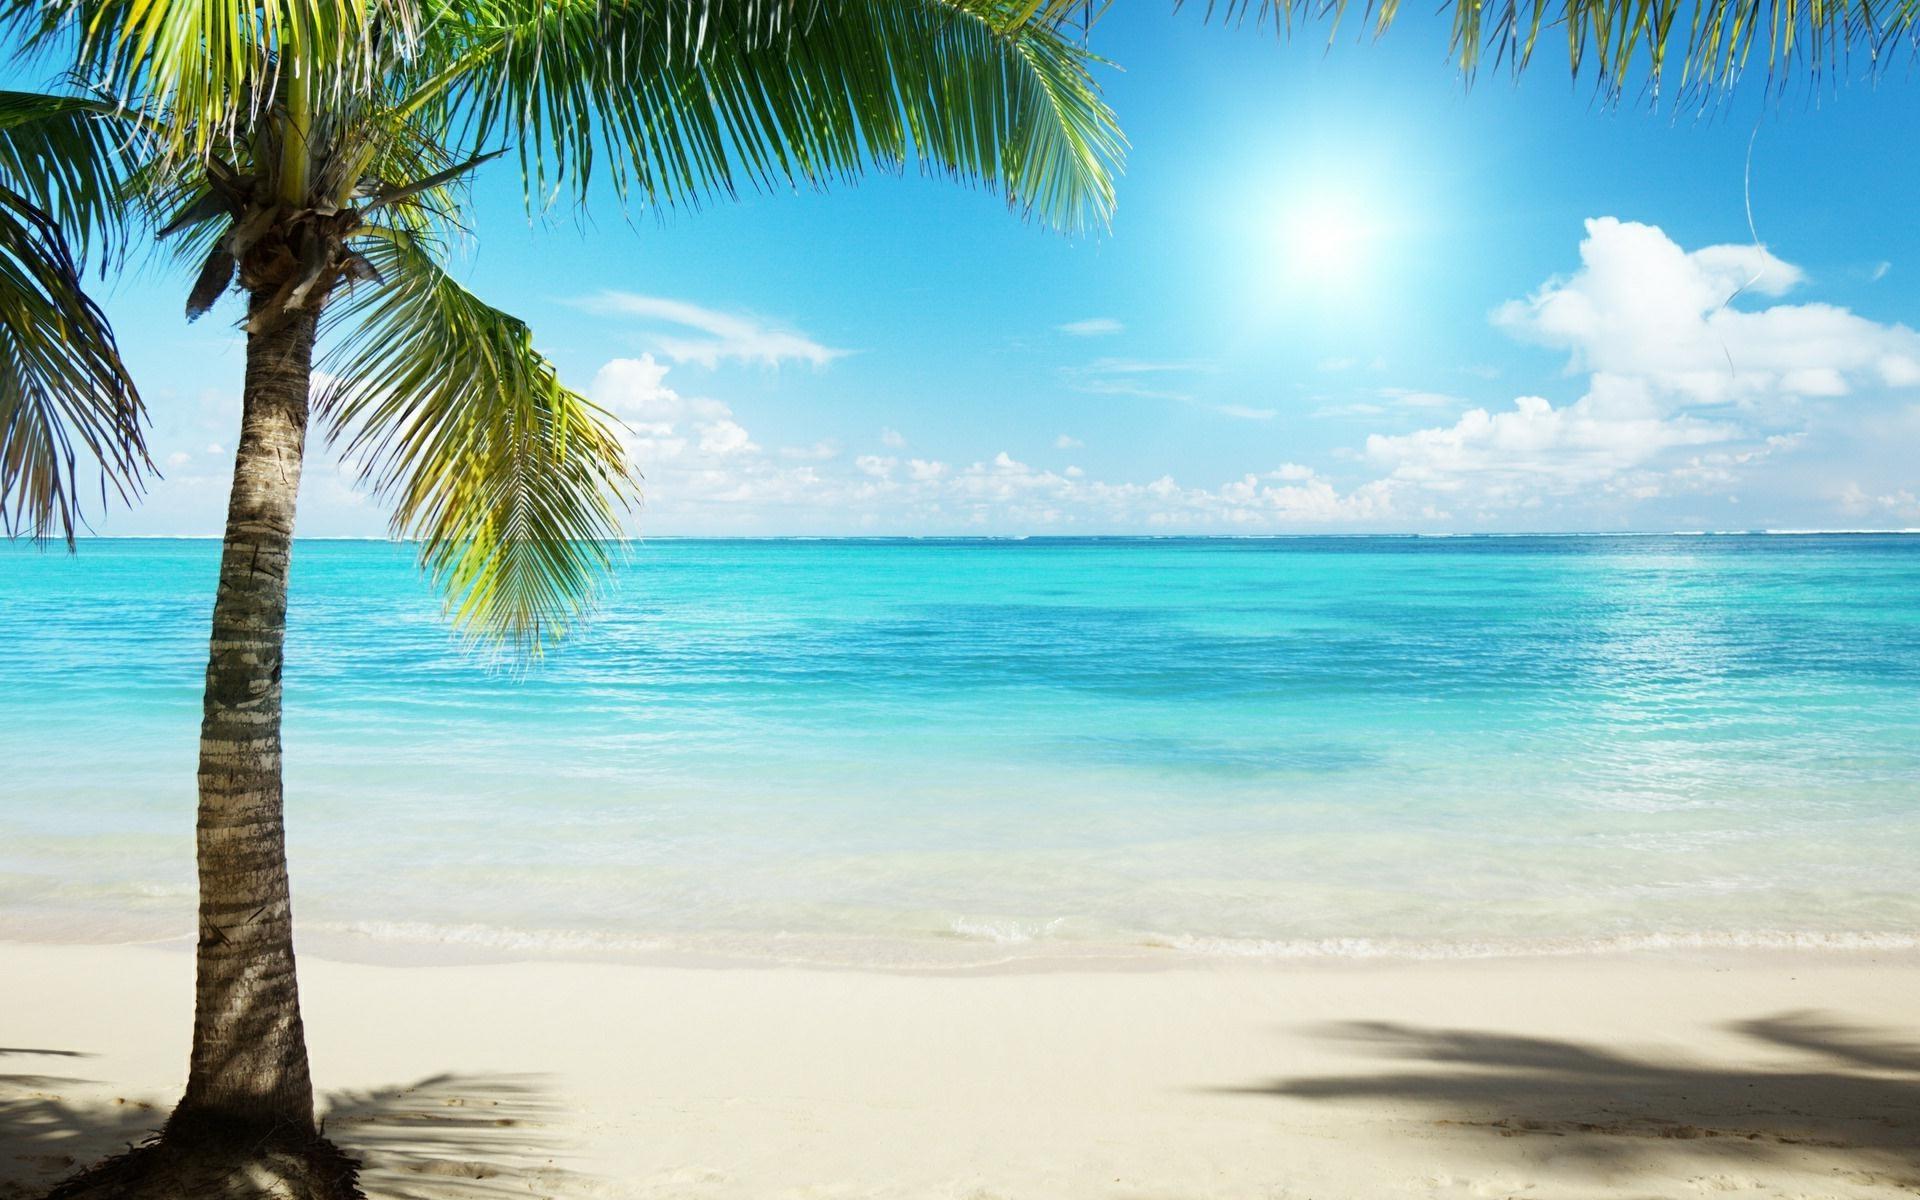 Tropical Beach Background wallpaper 1920x1200 6783 1920x1200